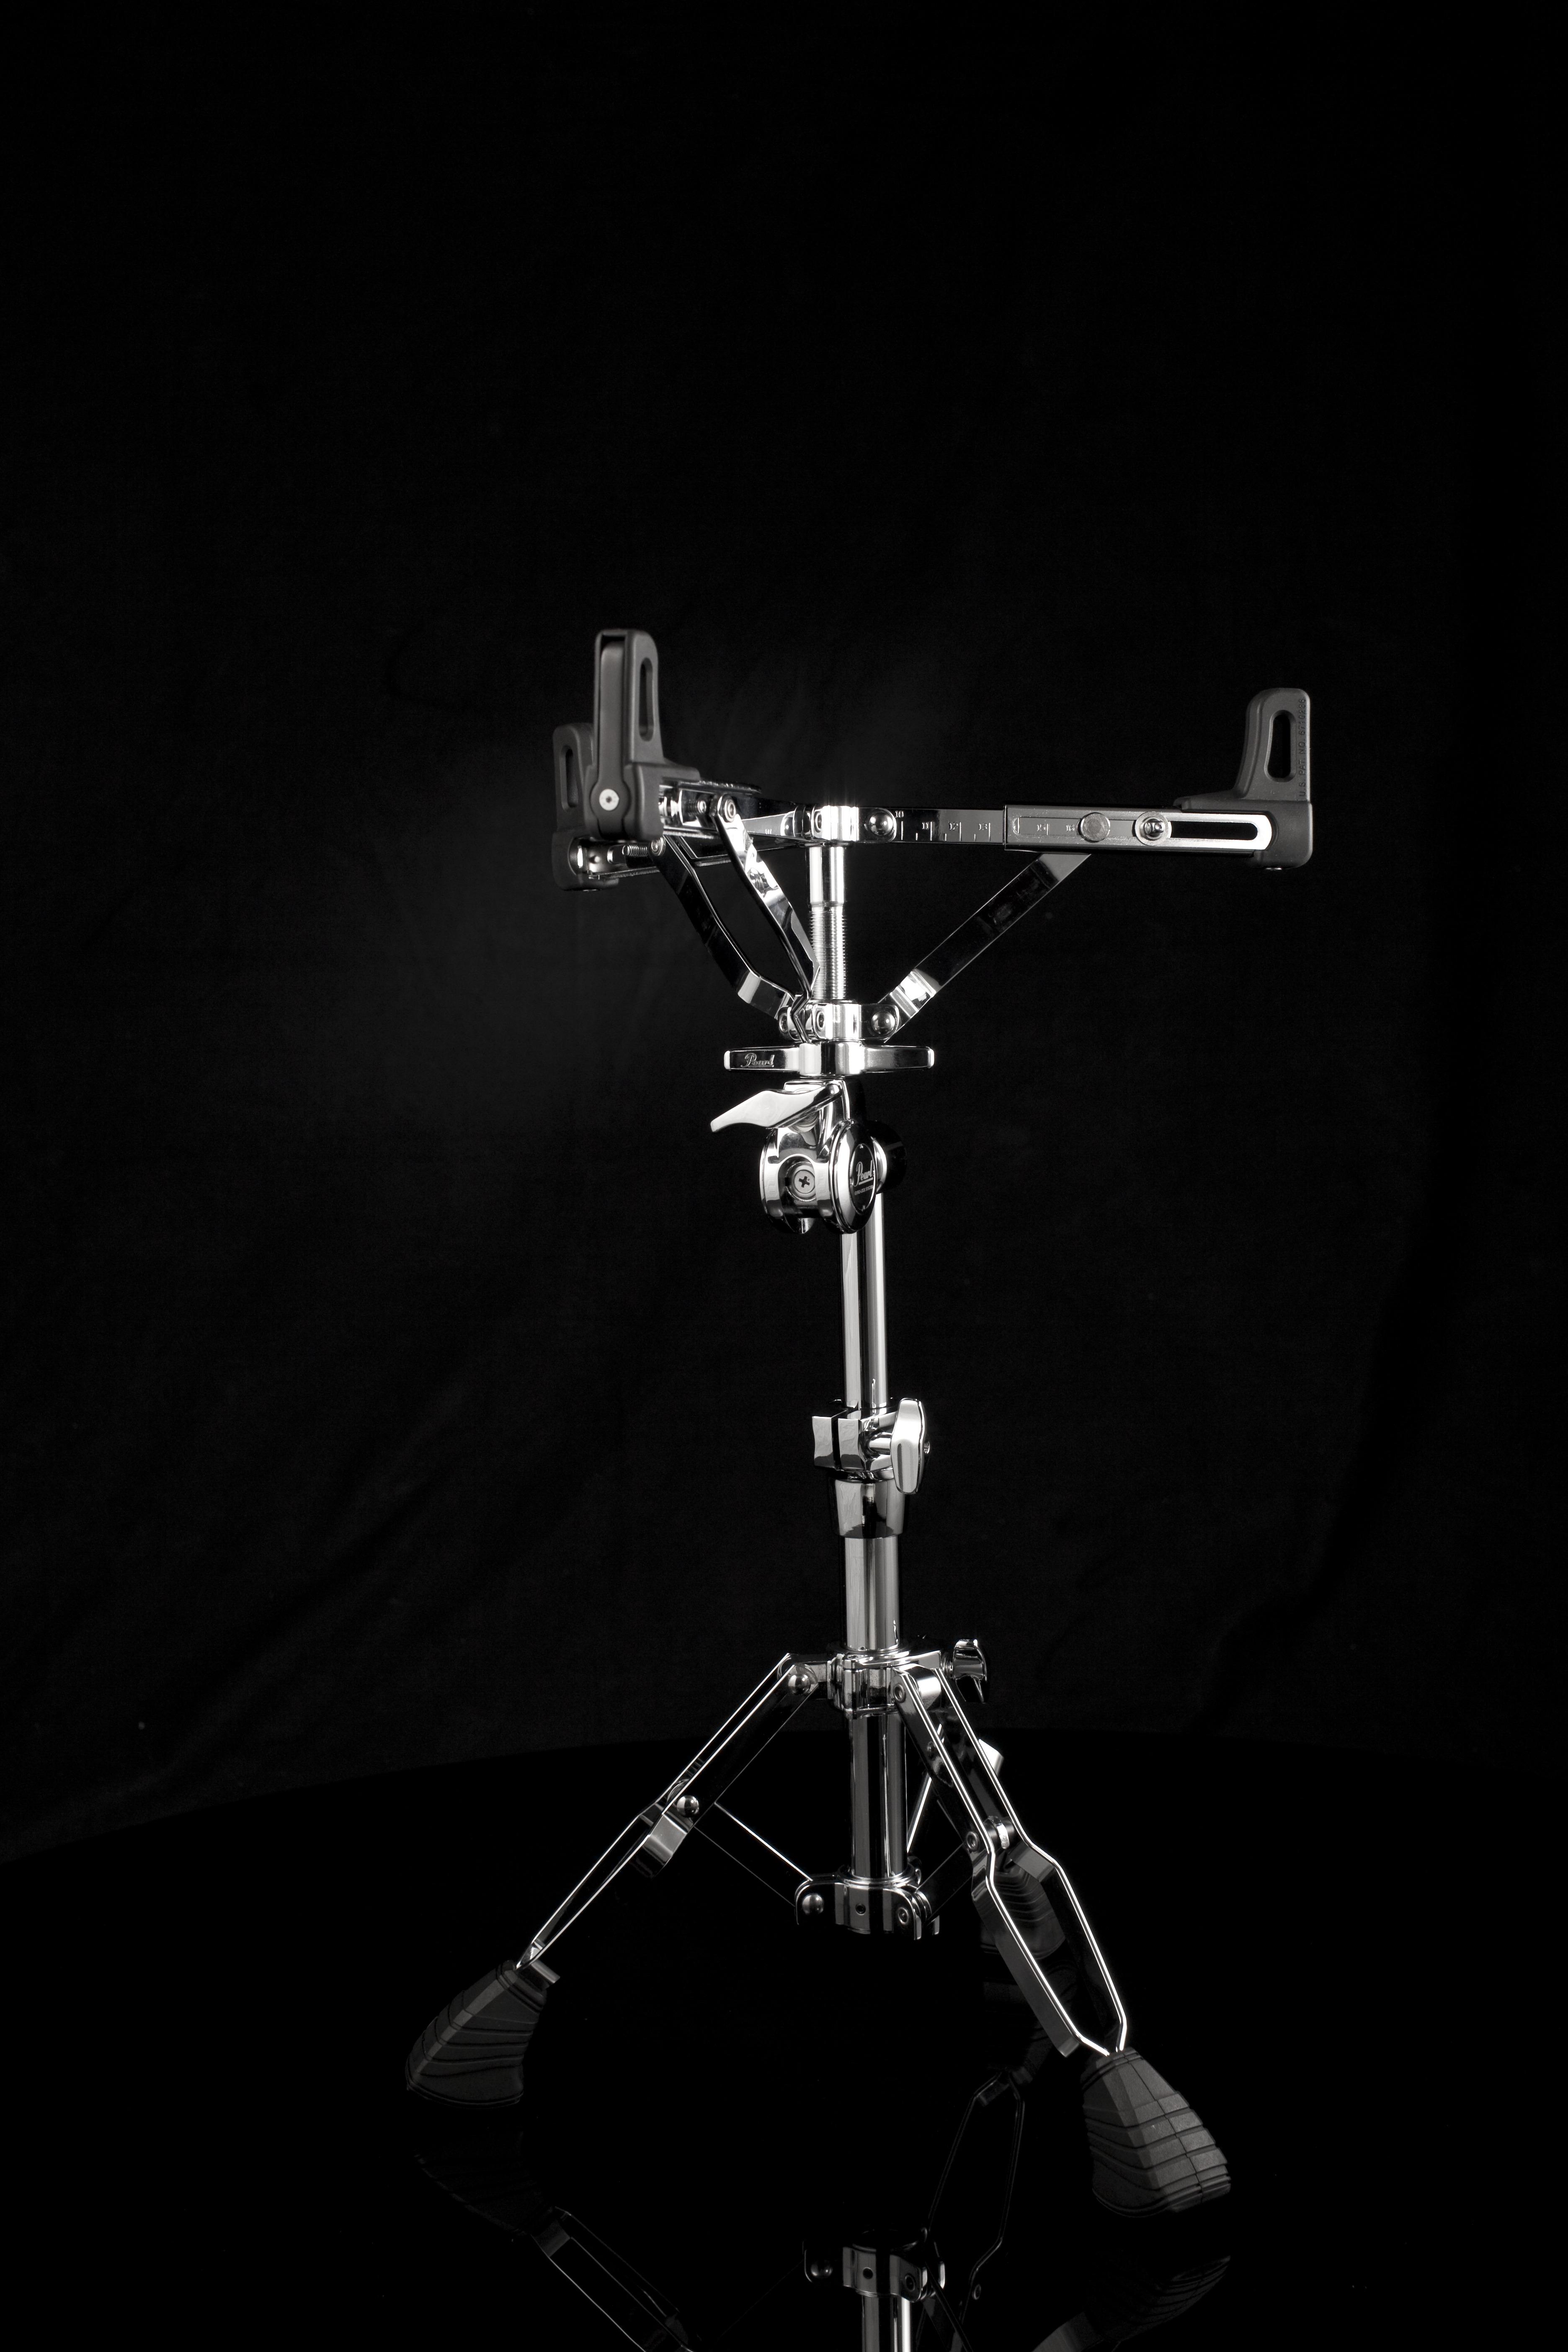 pearl s1030l extended concert height snare drum stand ebay. Black Bedroom Furniture Sets. Home Design Ideas